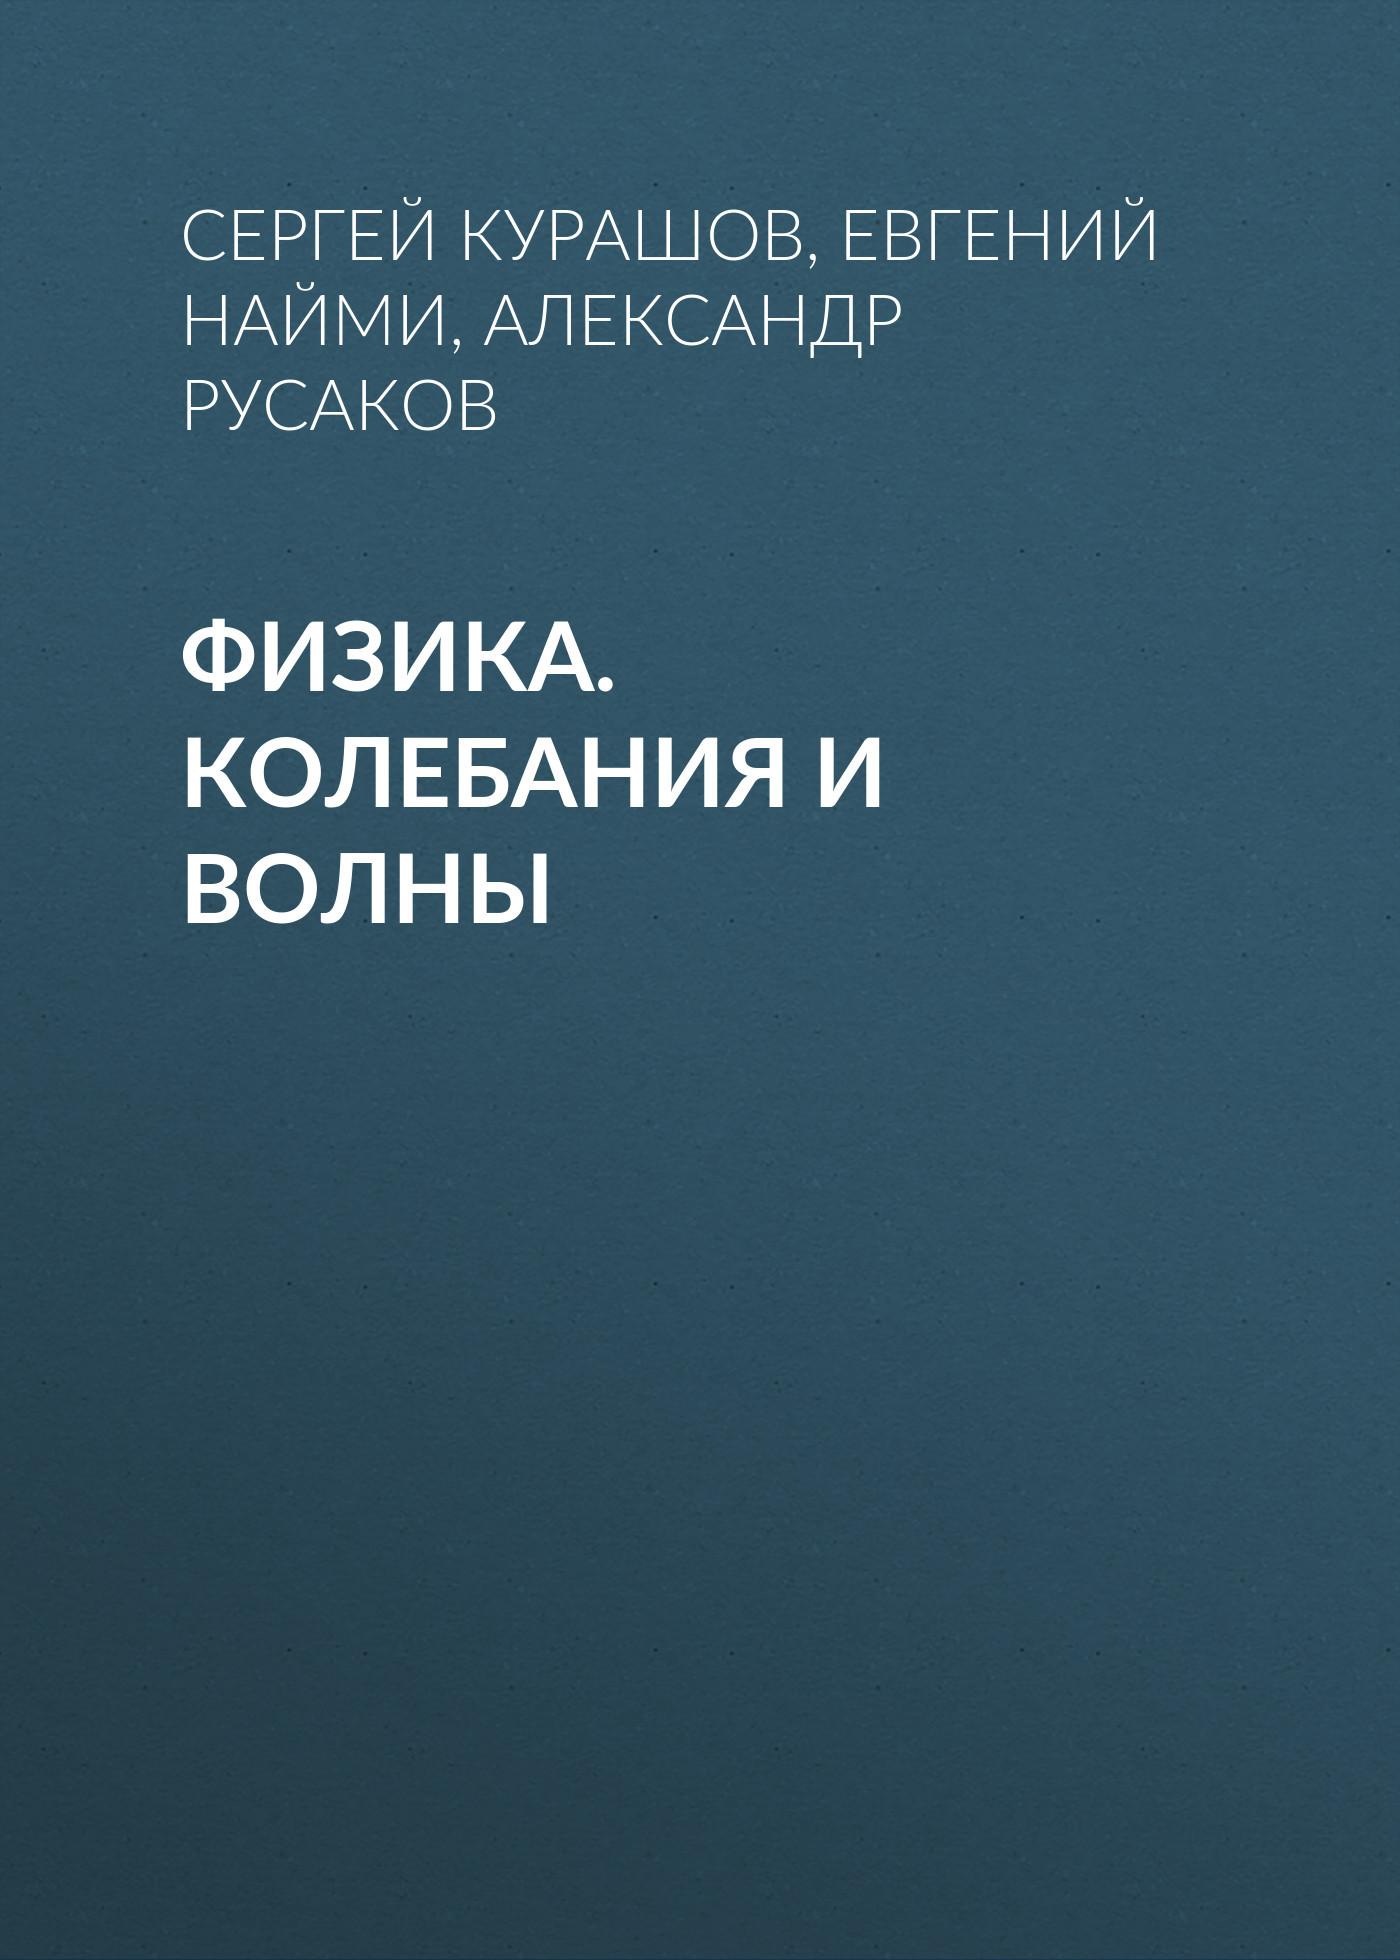 Александр Русаков. Физика. Колебания и волны